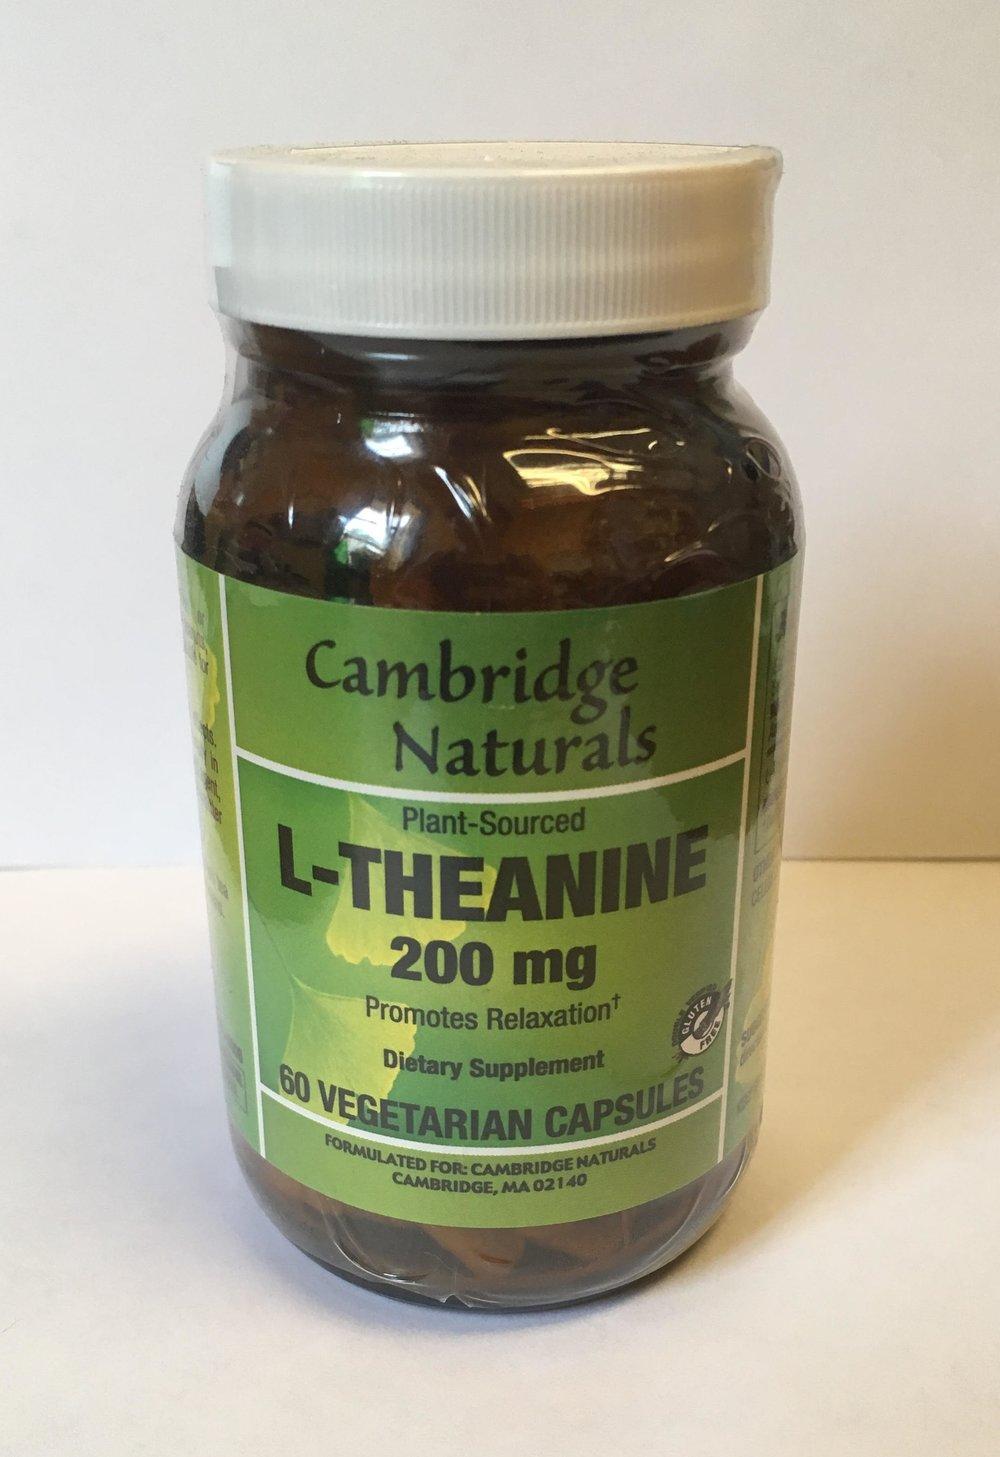 ltheanine.jpg